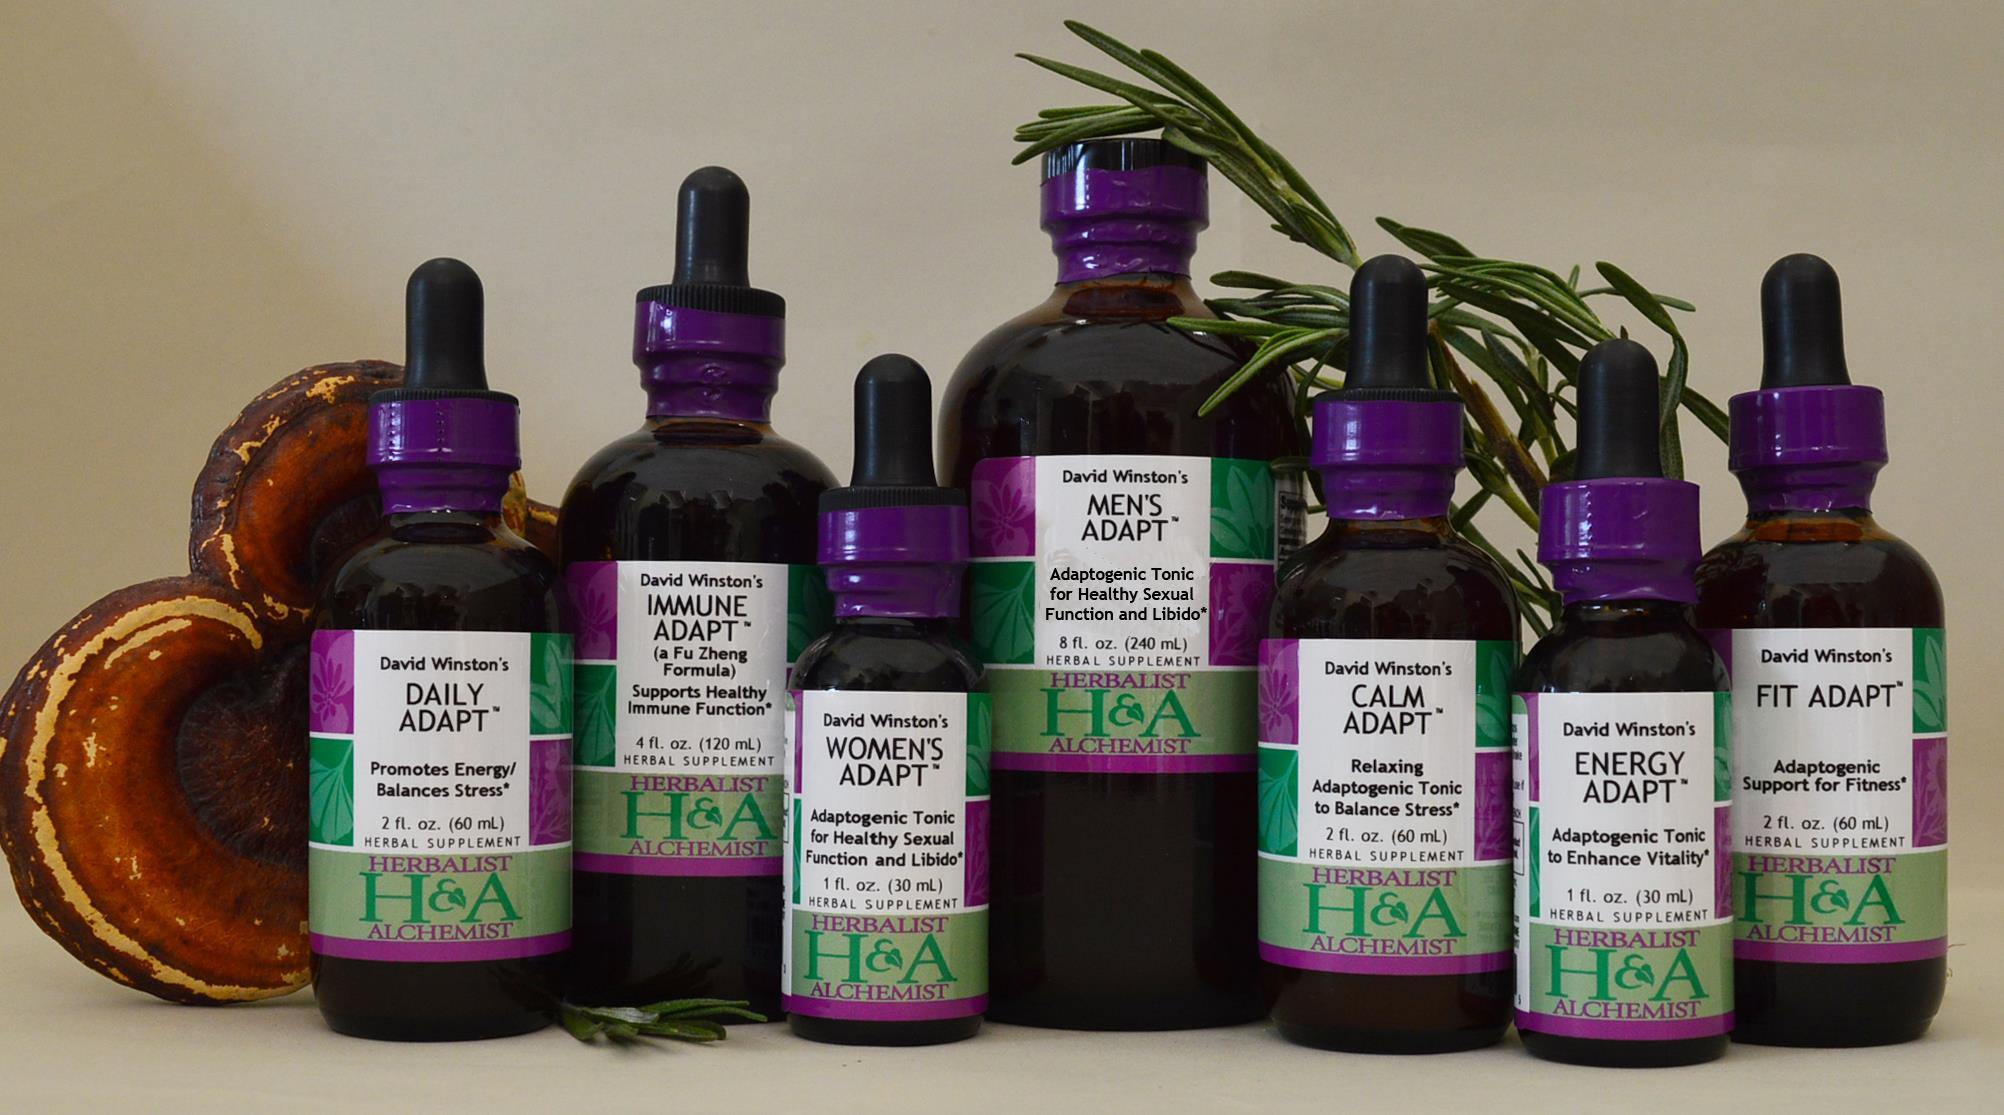 Herbalist & Alchemist's herbal extracts